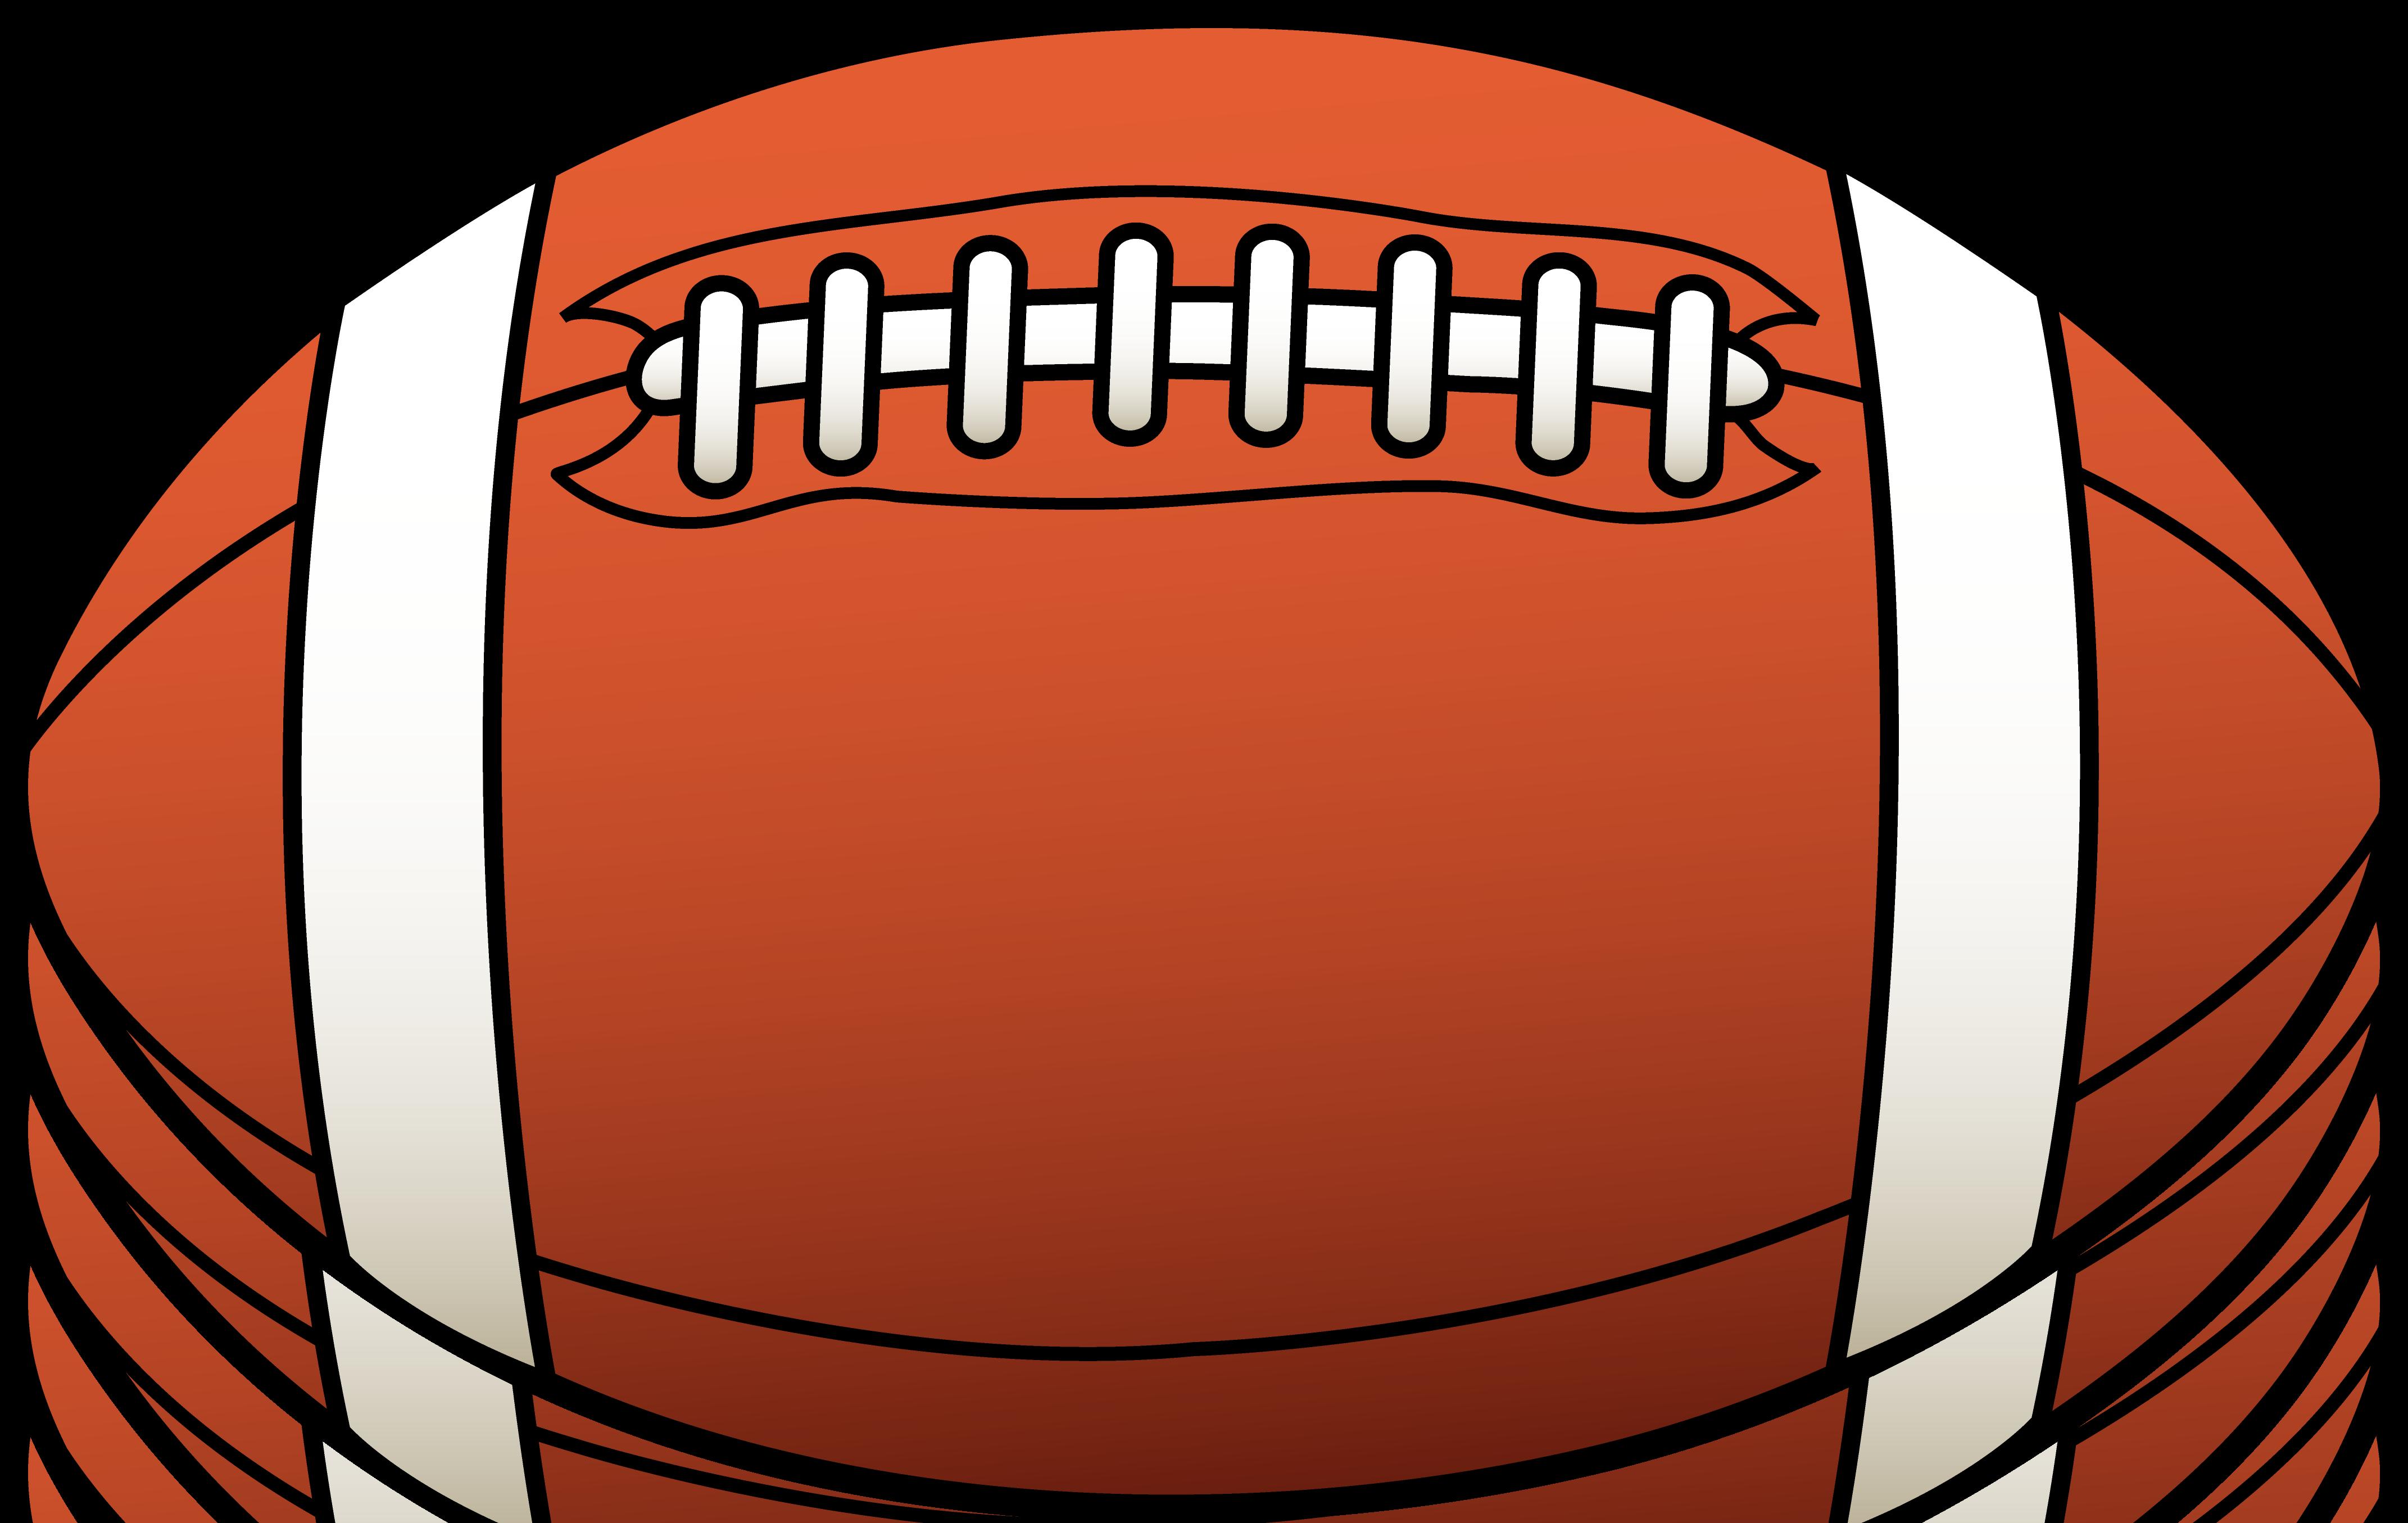 football clipart - Clip Art Football